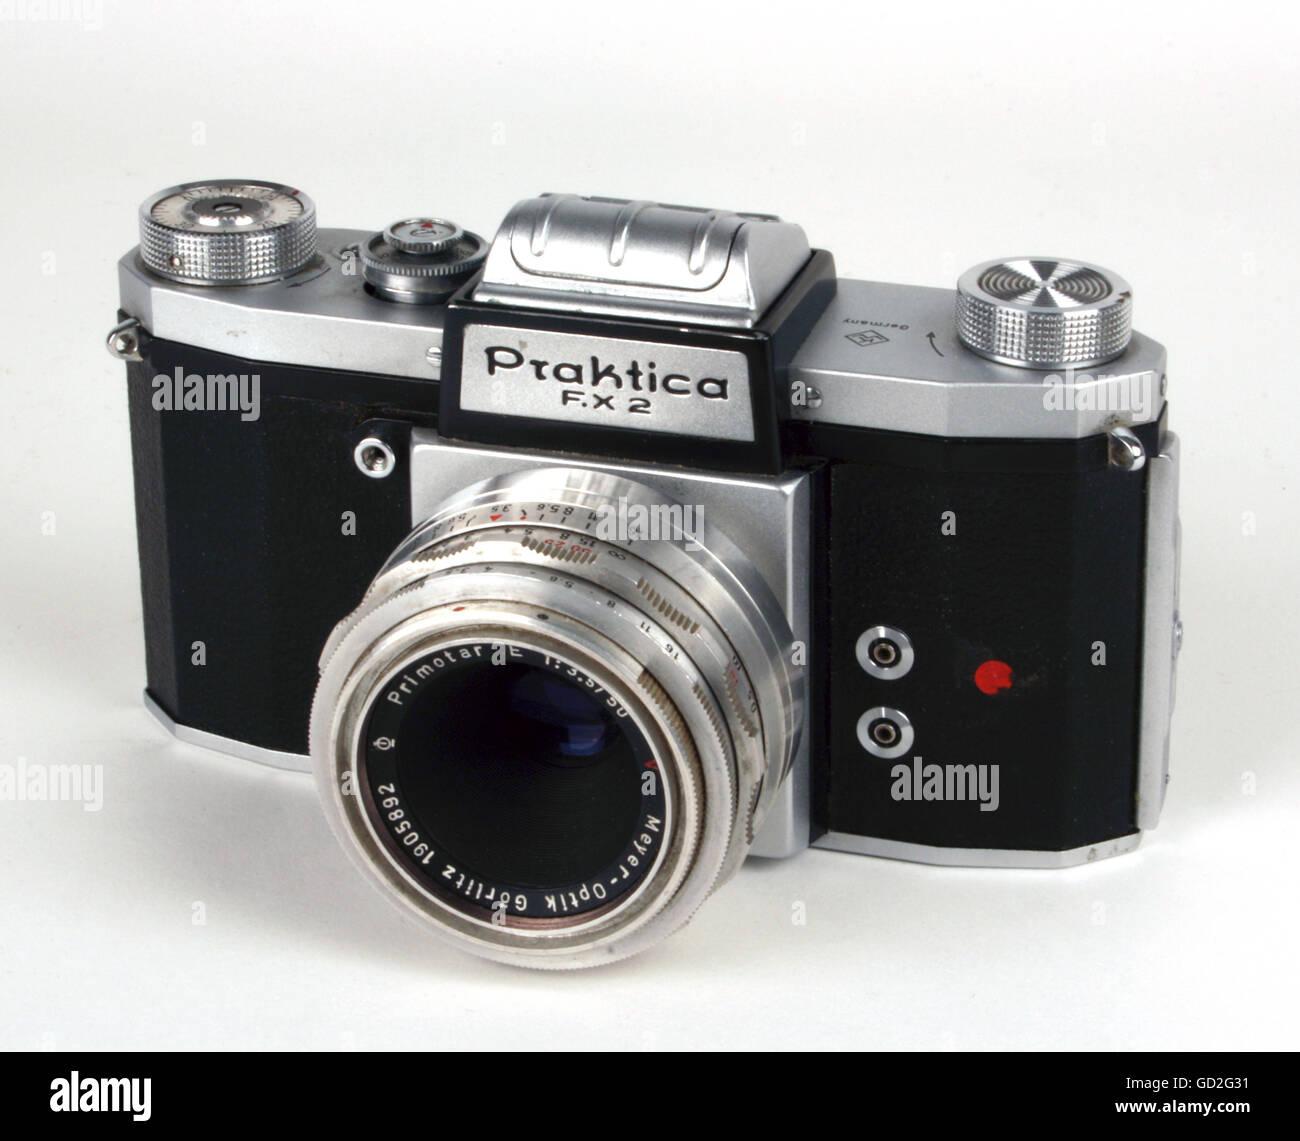 photography, cameras, reflex camera Praktica F.X 2, design: design by factory, made by: VEB Kamera- und Kinowerke - Stock Image